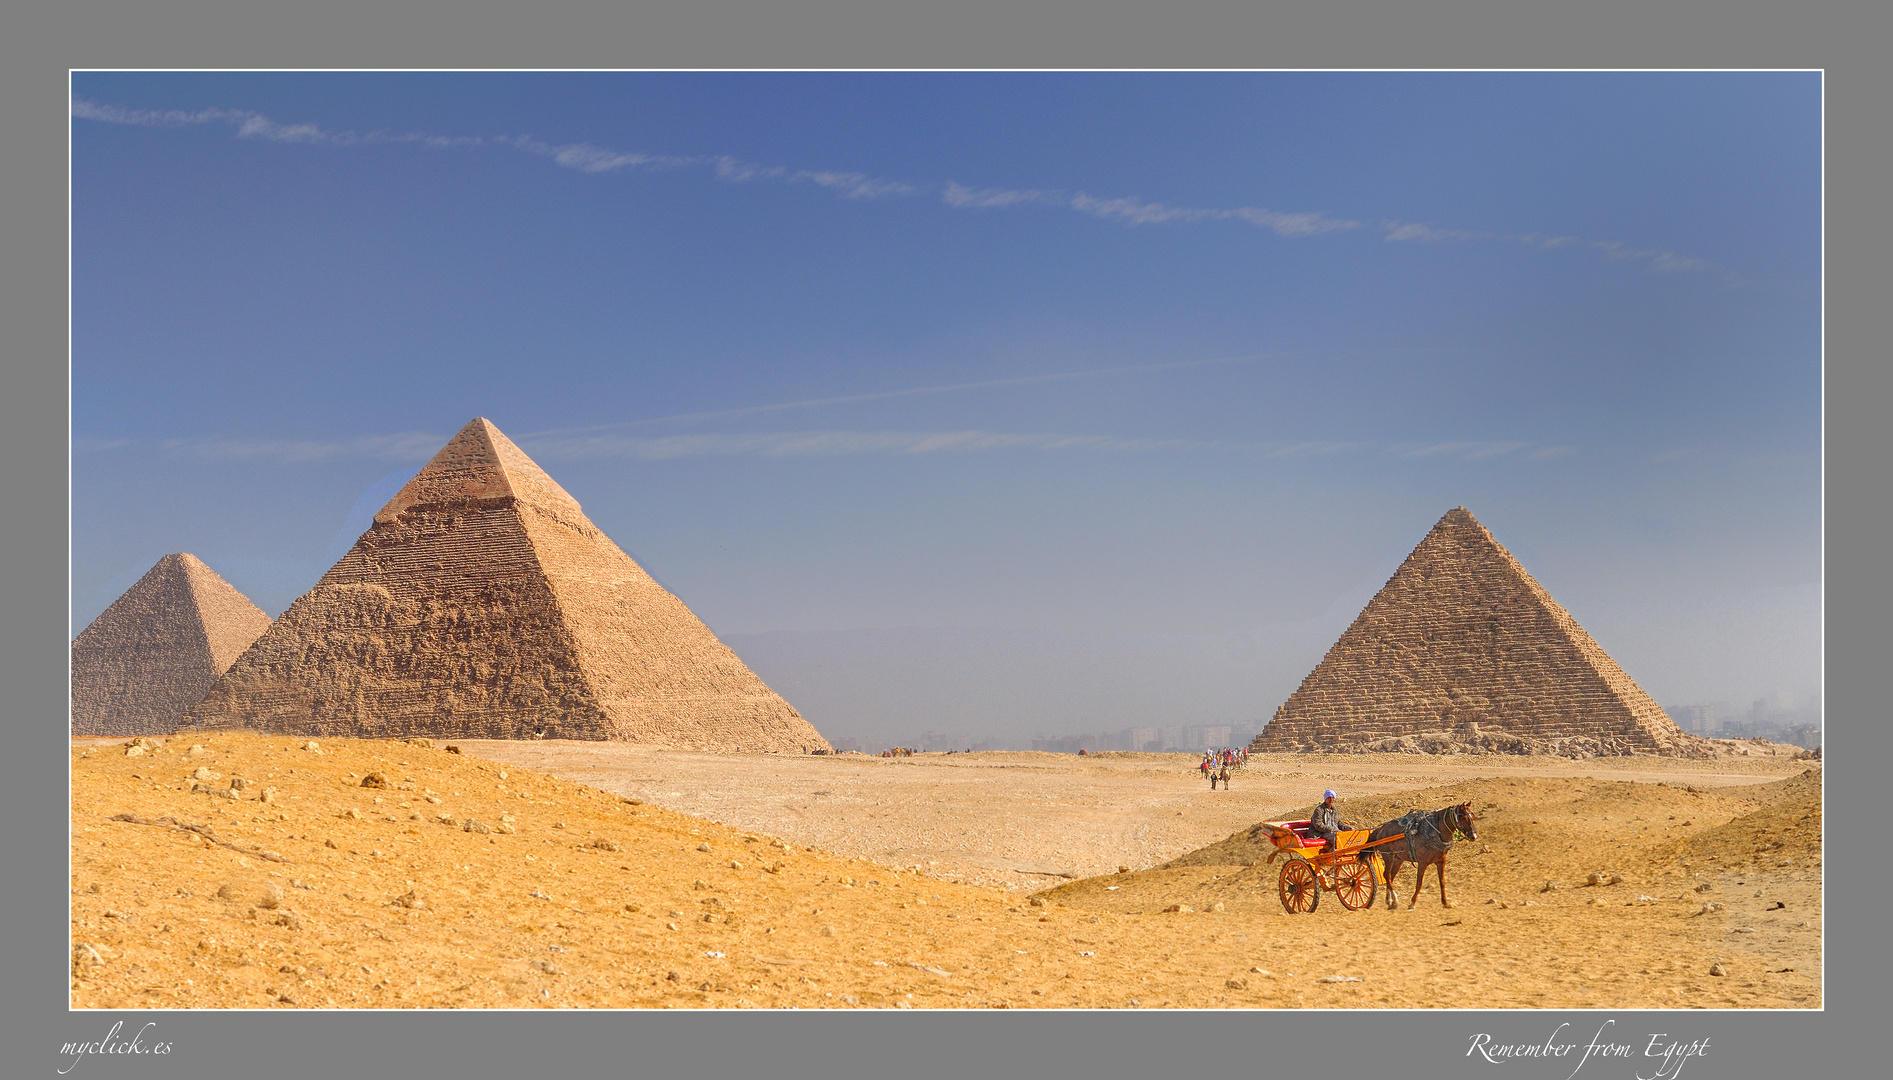 MEMORIAS DE AFRICA-LAS PIRAMIDES Y CARROMATO -GUIZA-EGIPTO